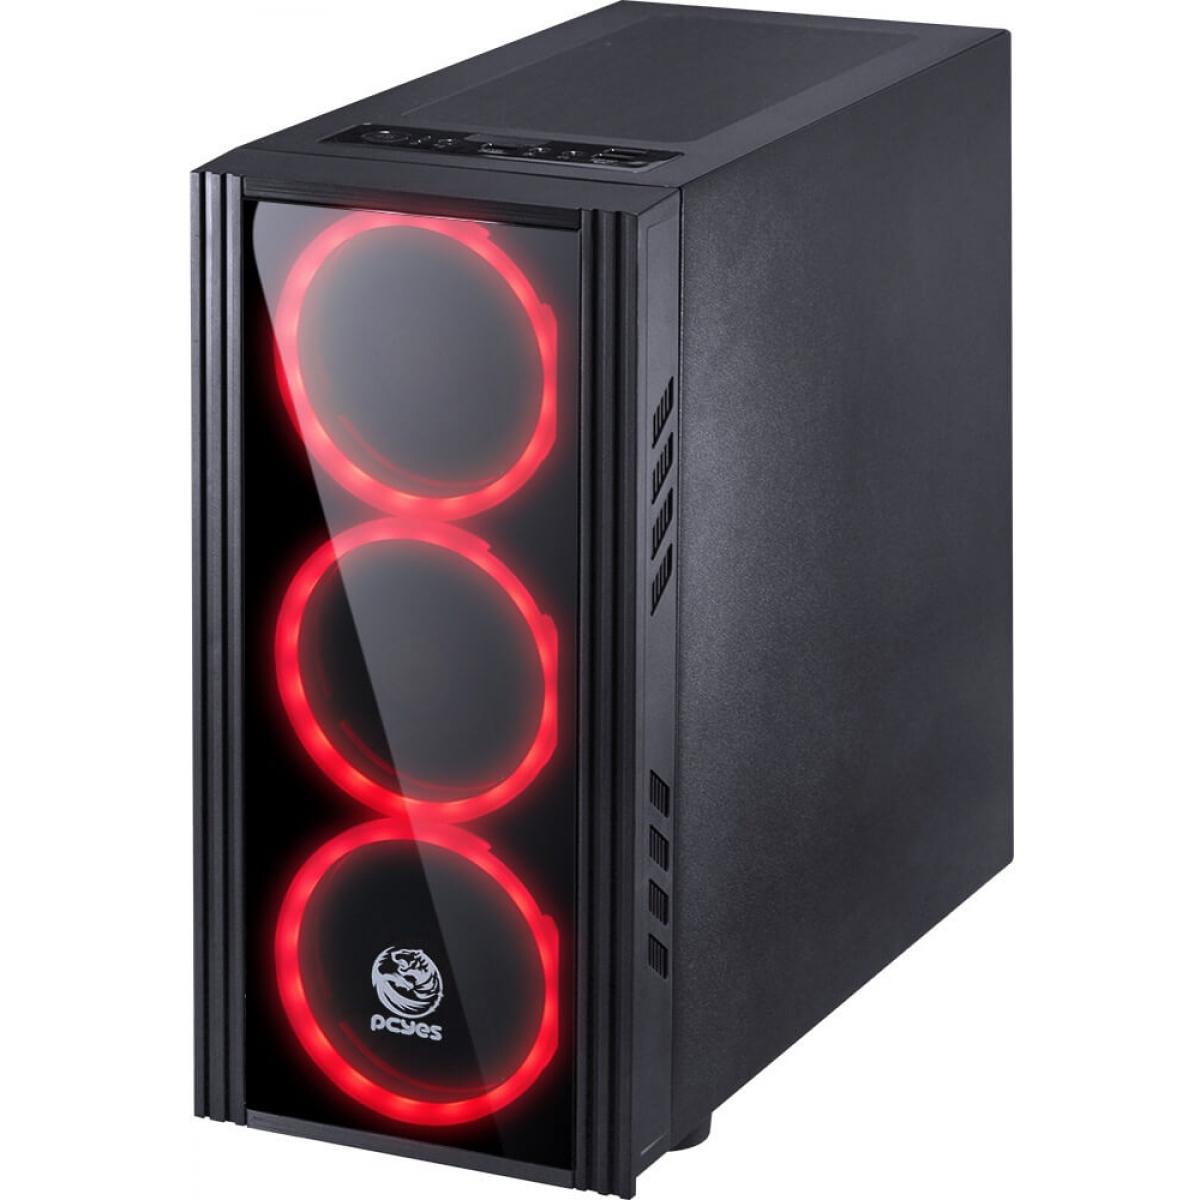 Gabinete Gamer PCyes Saturn, Mid Tower, Com 3 Fans Red, Lateral de Acrílico, Black, S-Fonte, SATPTVM3FCA